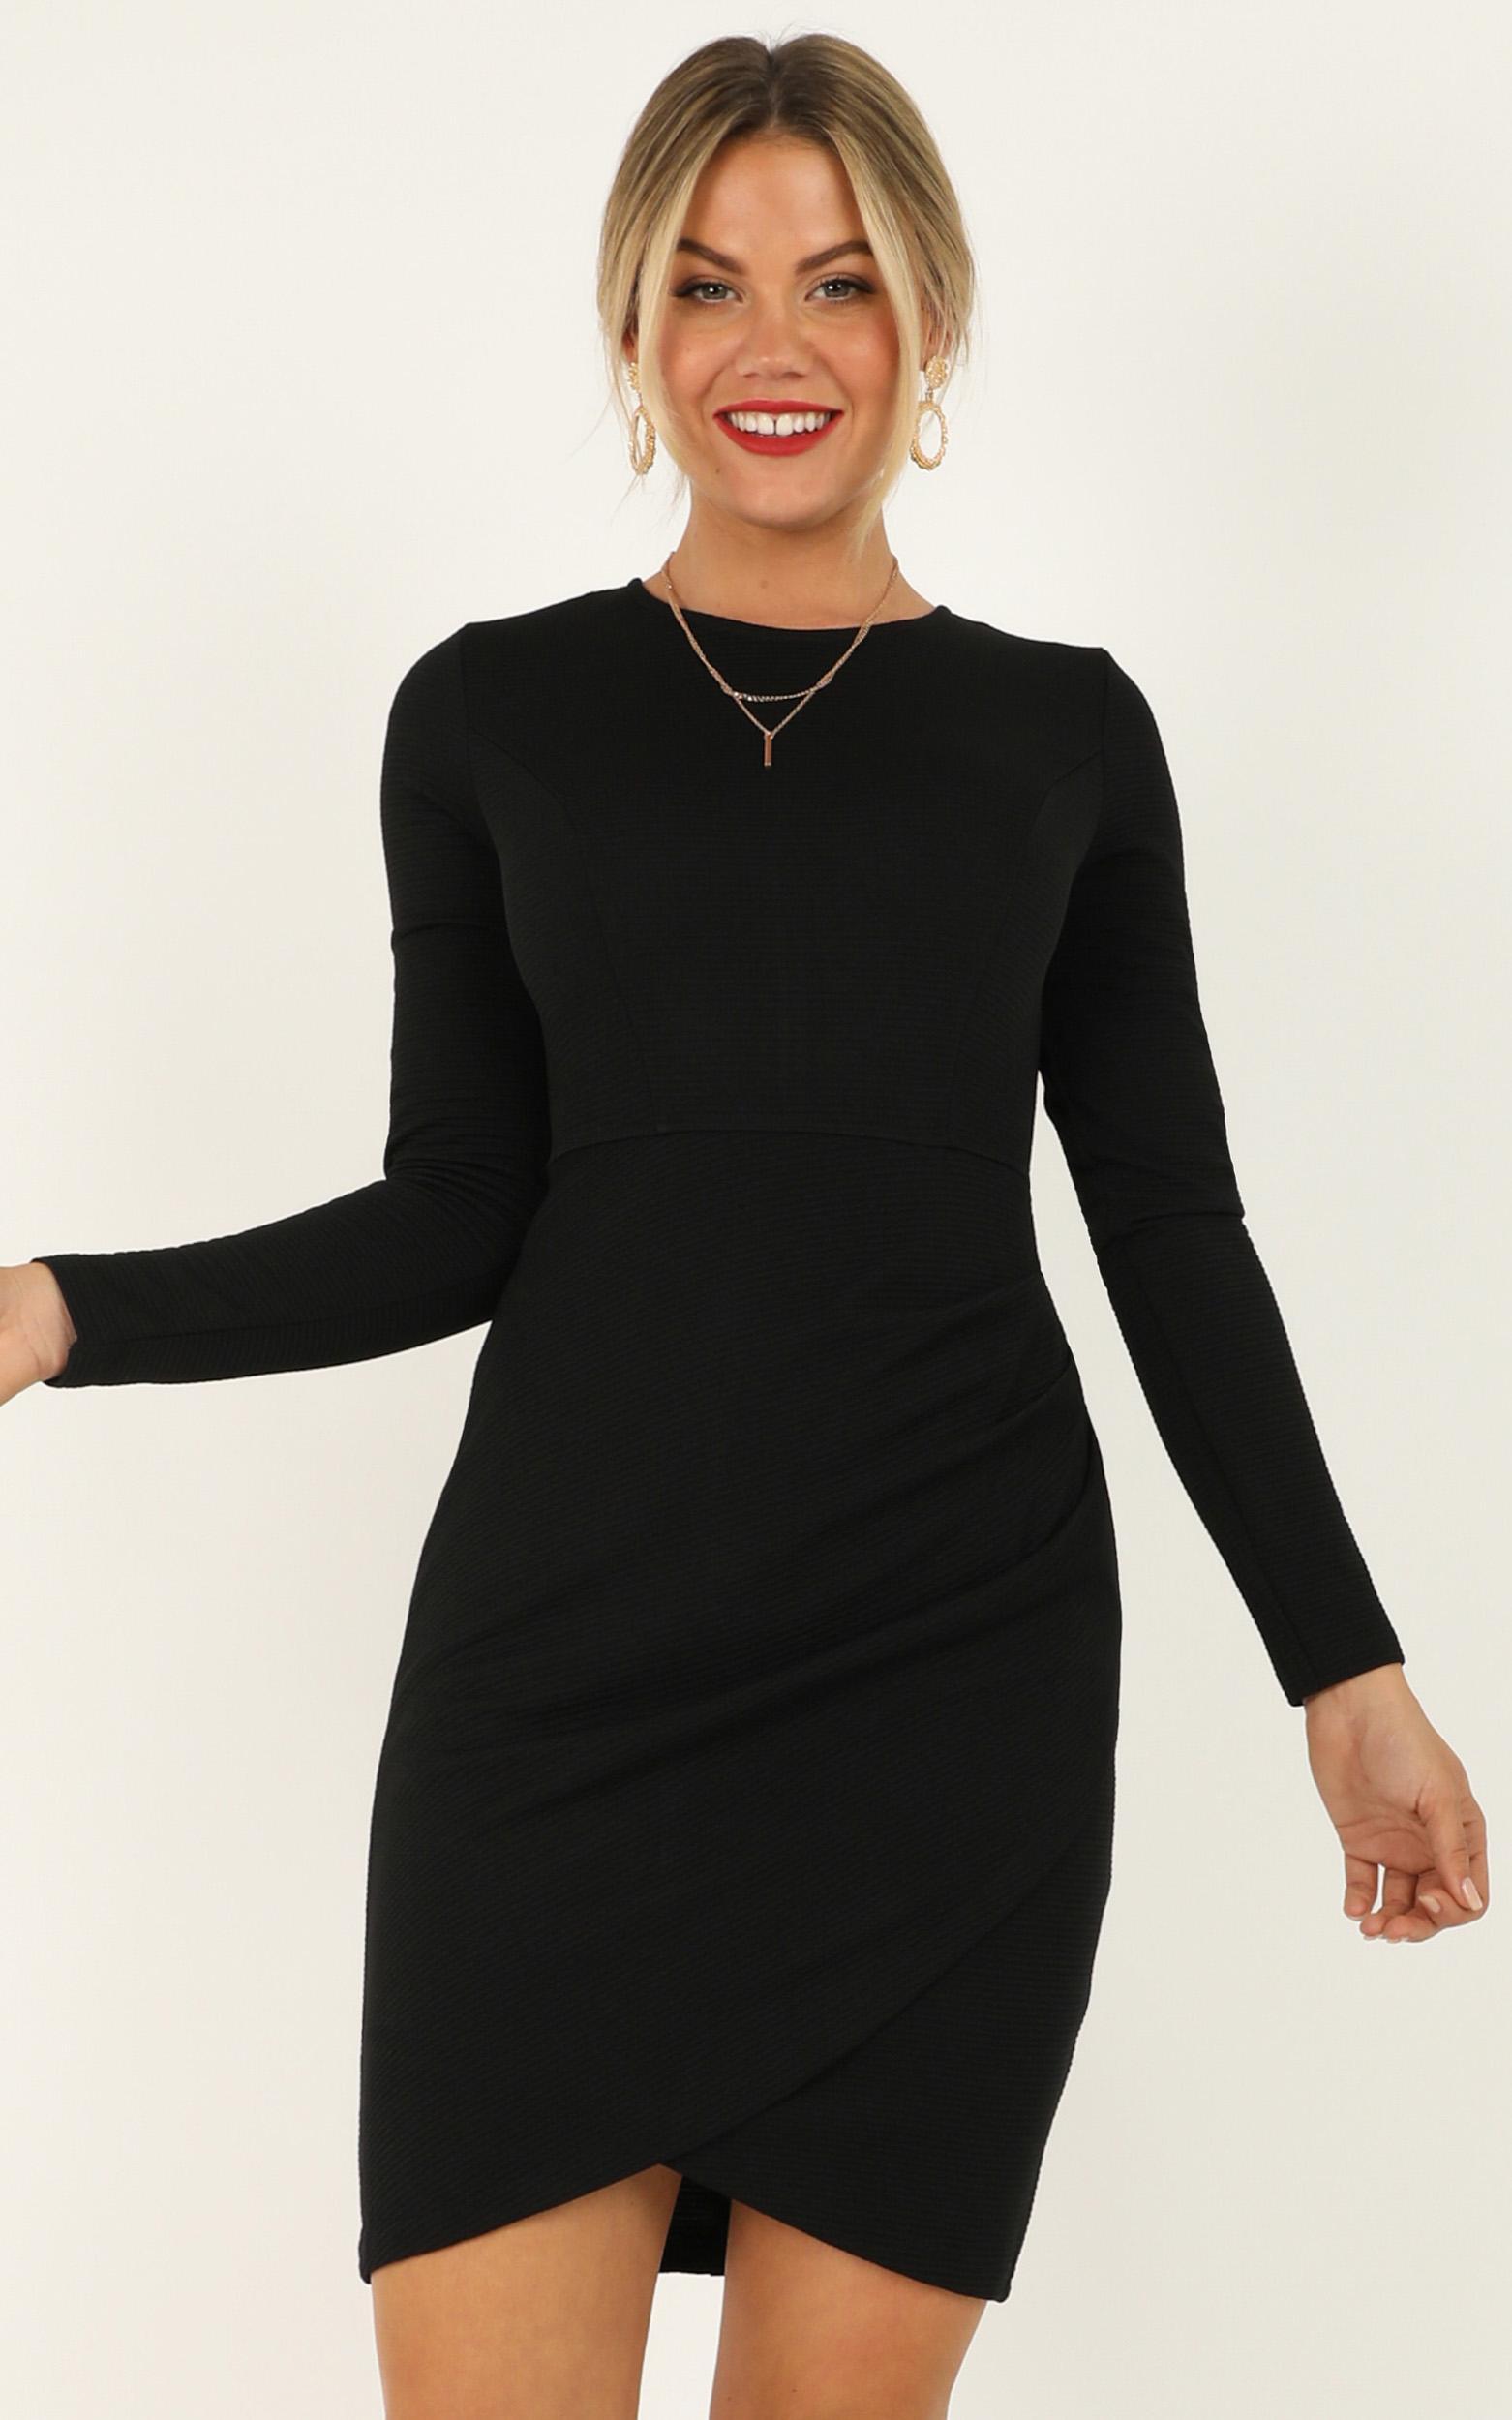 No Rain dress in black - 14 (XL), Black, hi-res image number null